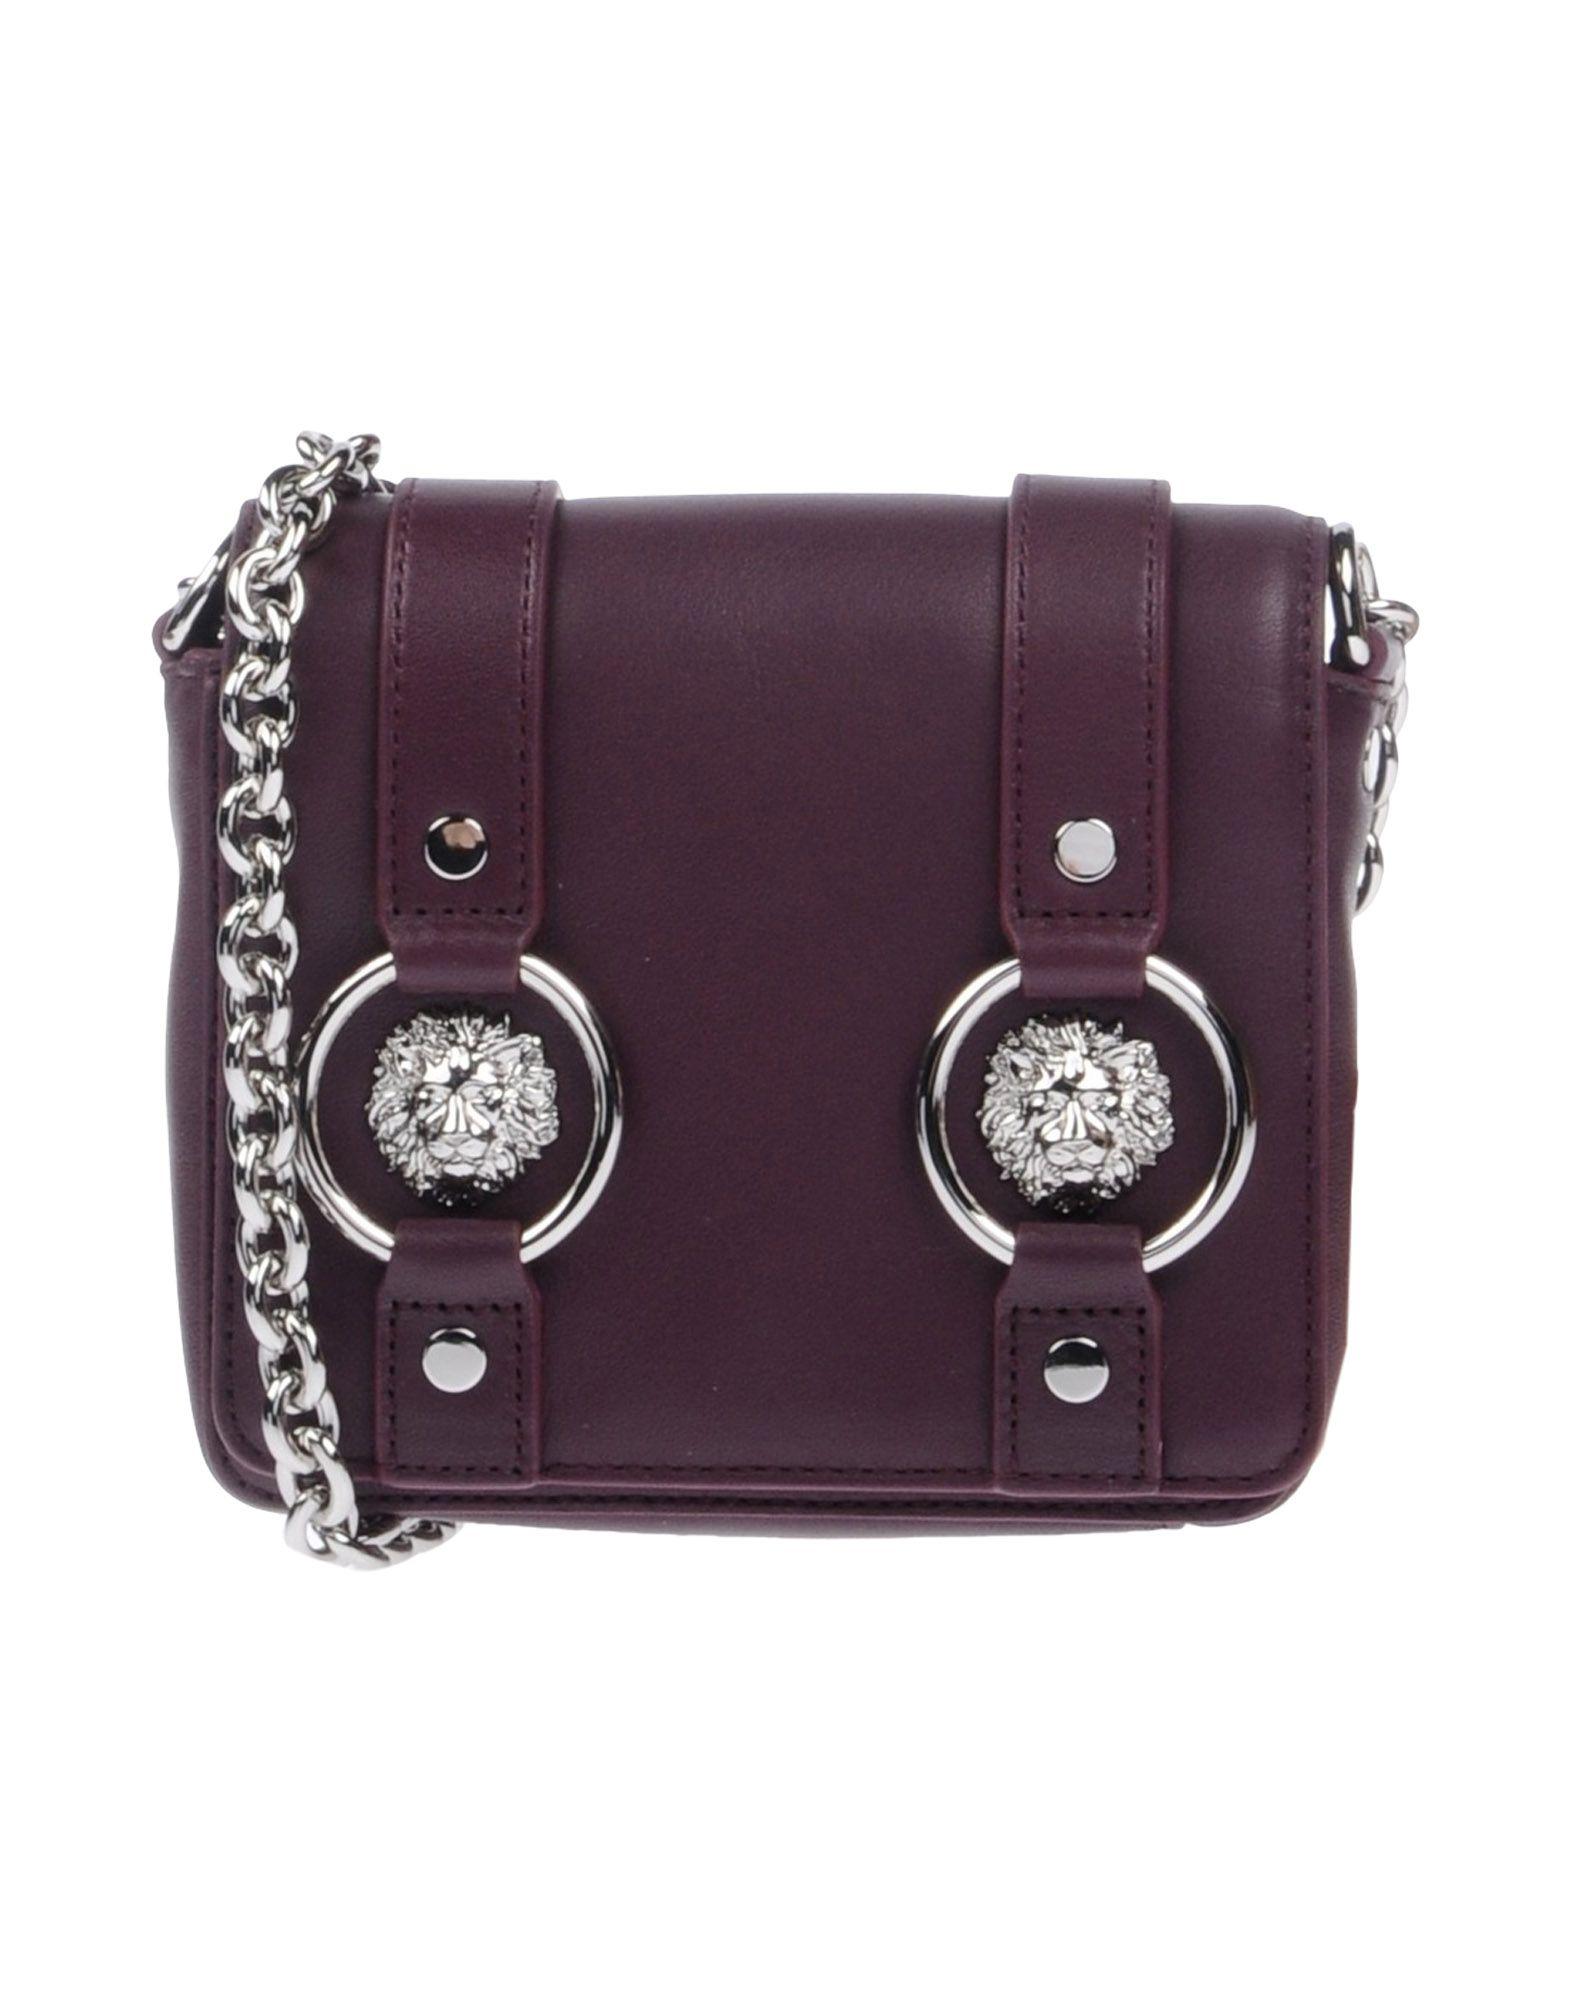 b6ea37f640 Versus Versace Handbags - Versus Versace Women - YOOX United States